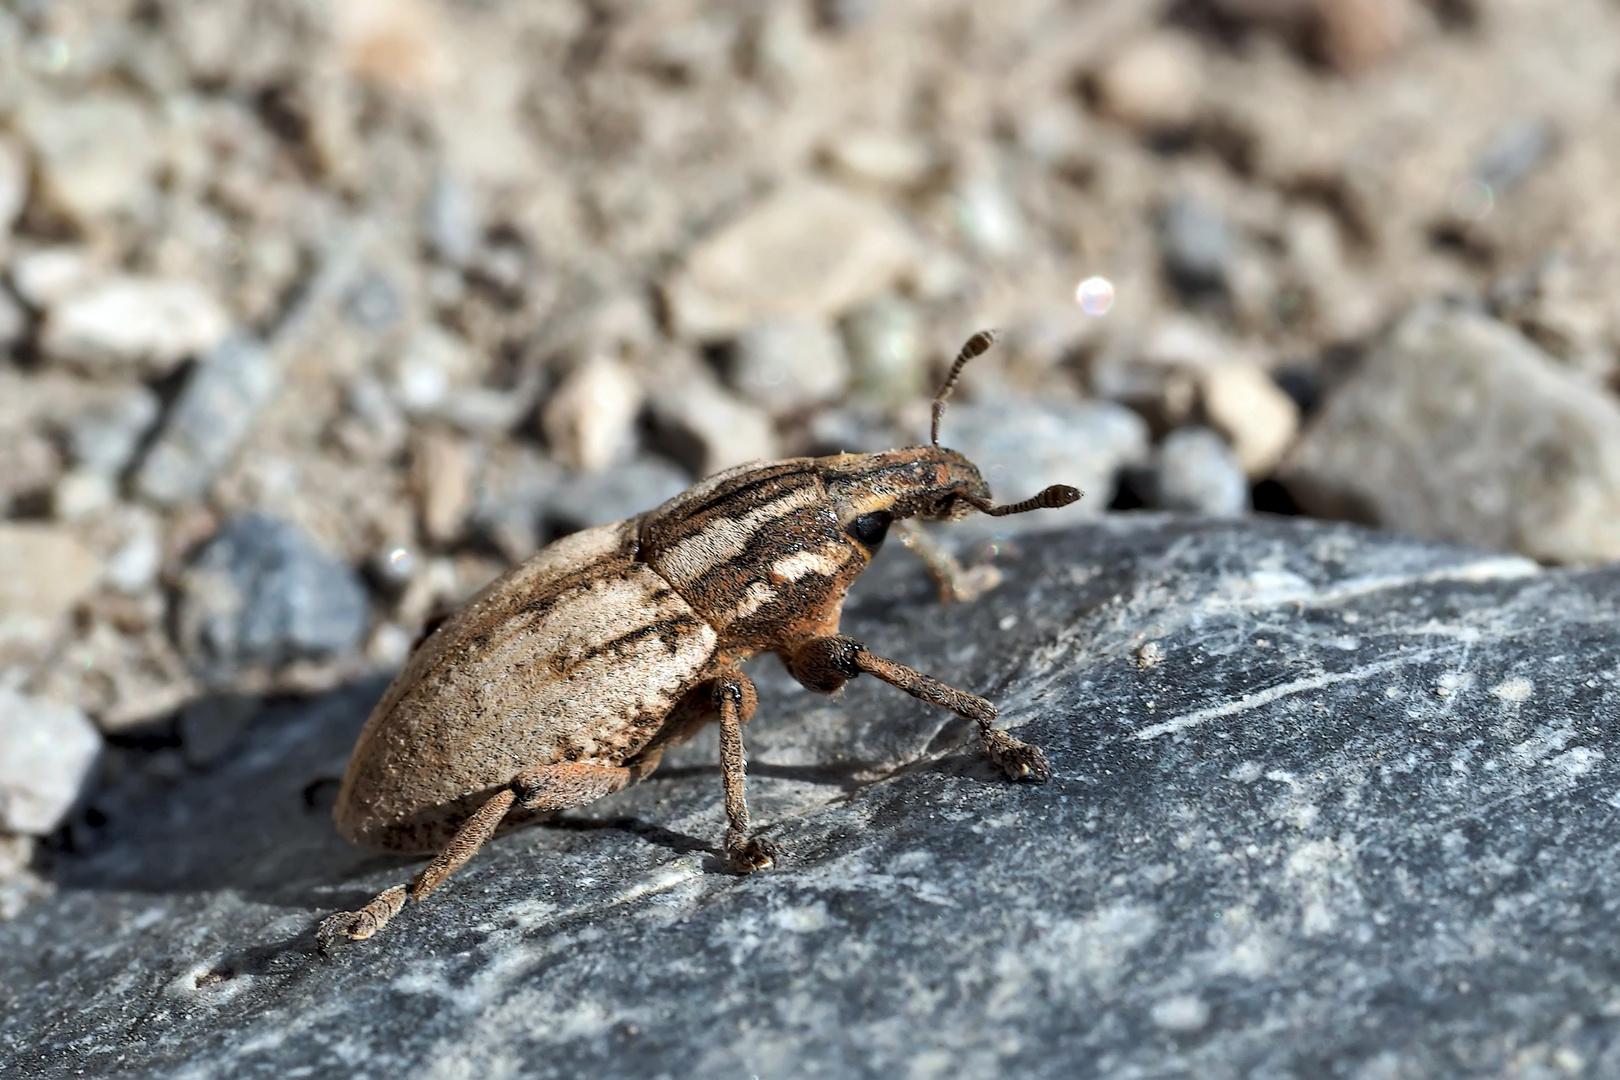 Seltener Flaumiger Rübenrüssler (Pseudocleonus cinereus). - Un charançon rare dans nos régions!